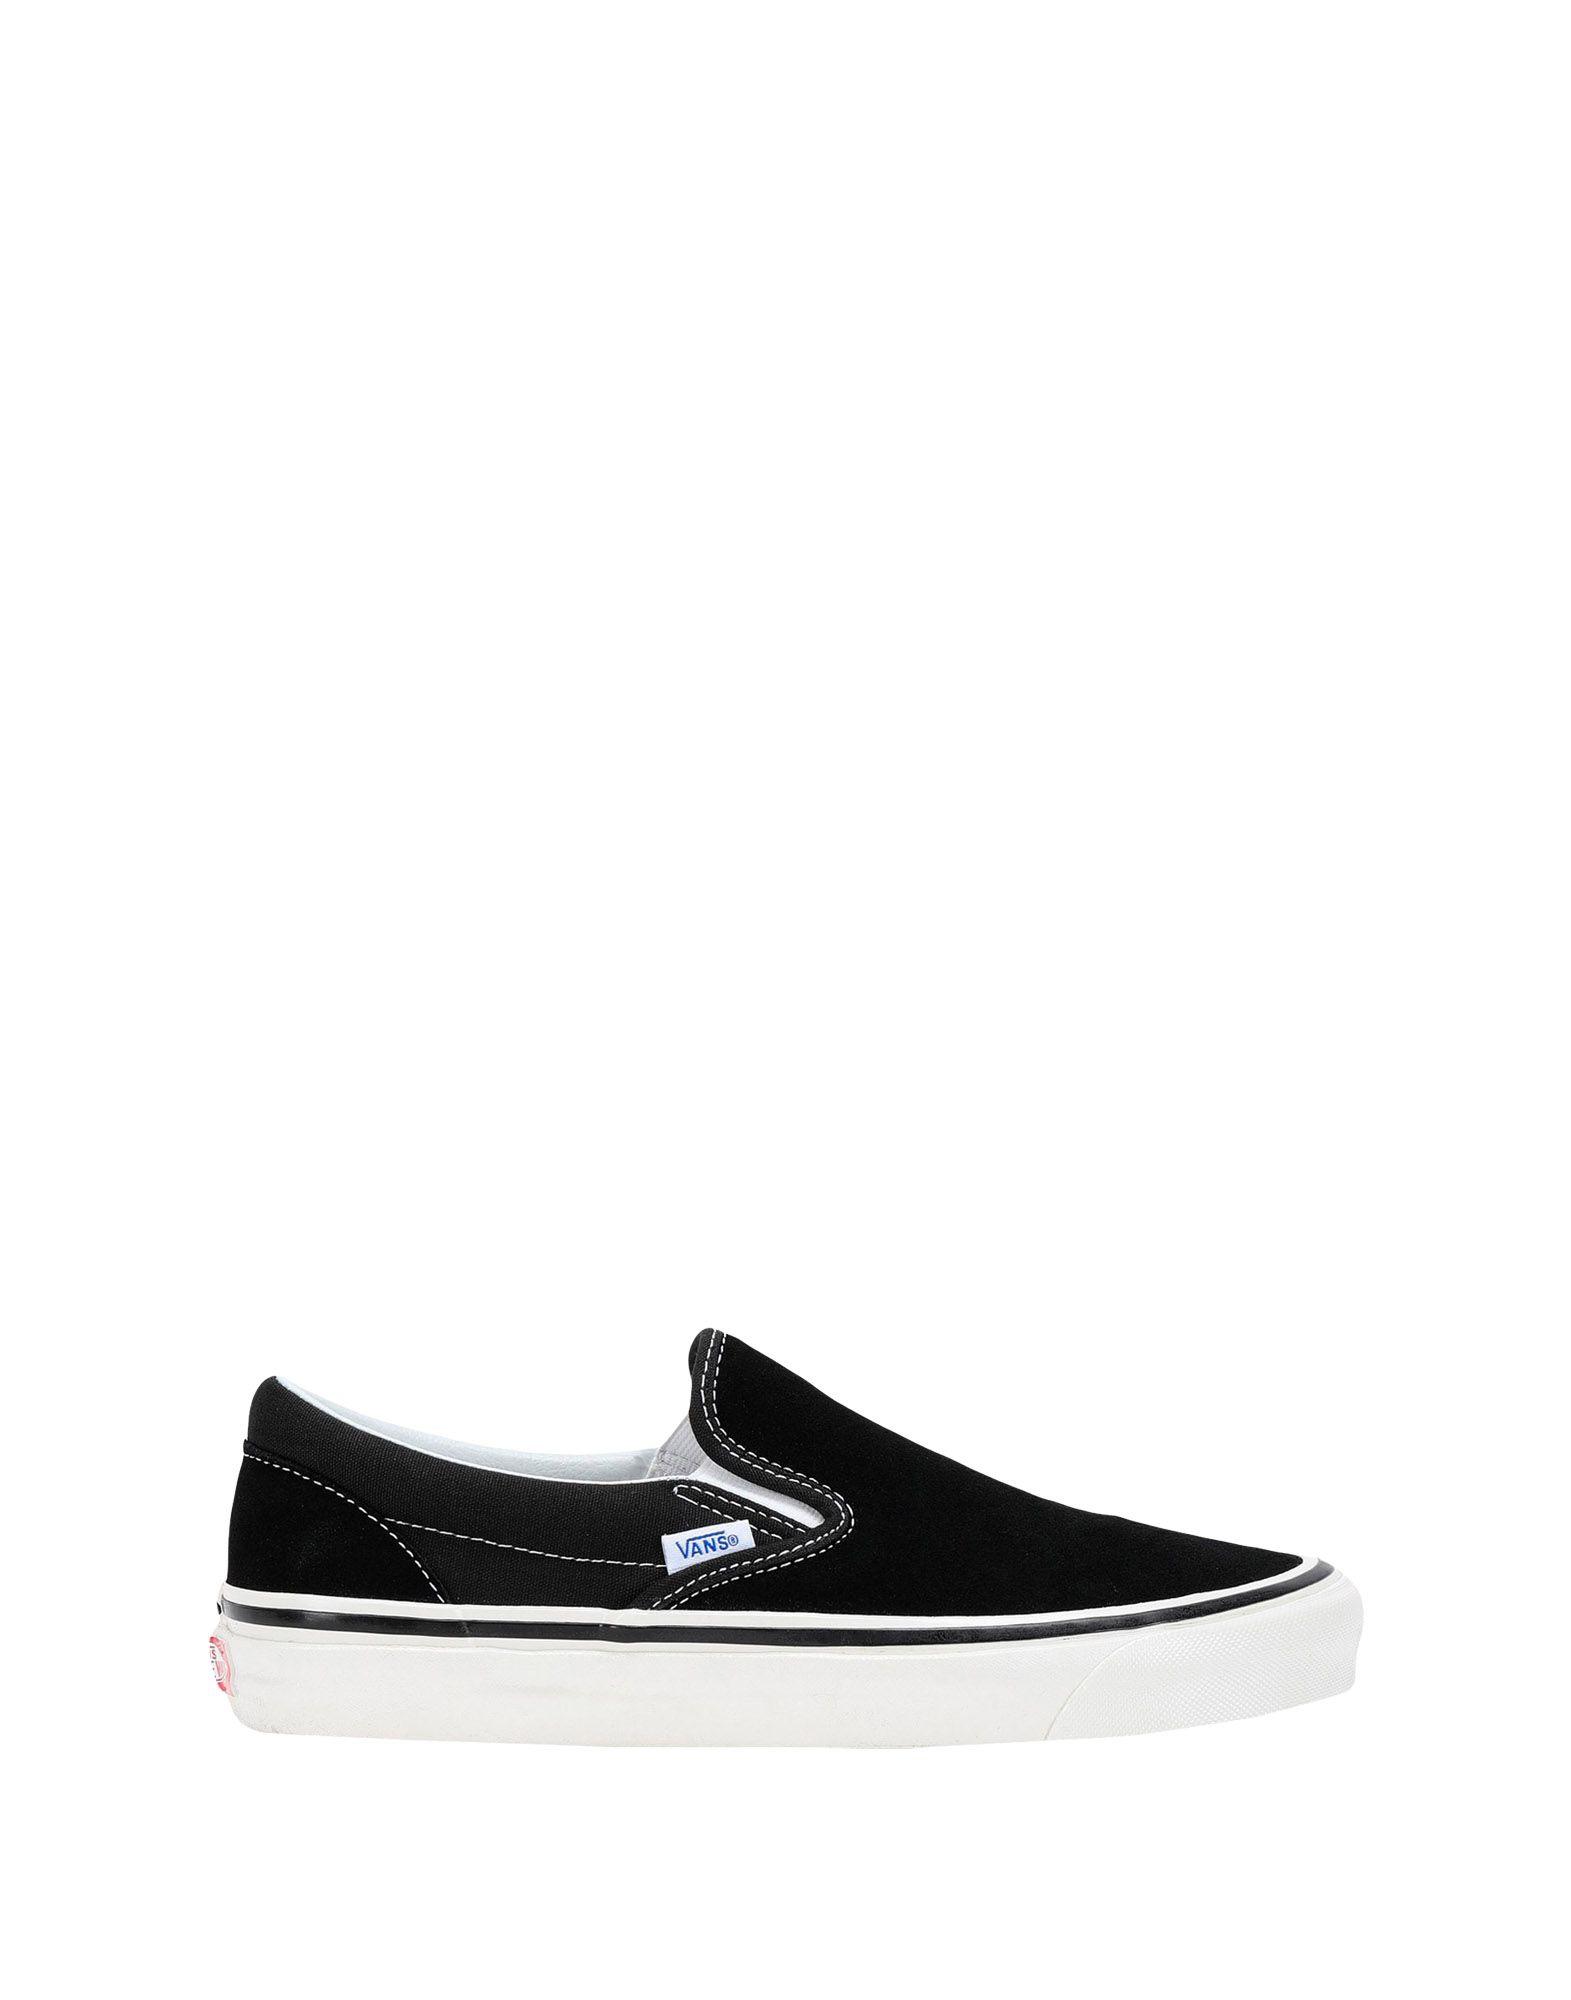 Scarpe da Ginnastica Vans Ua Classic Slip-On 9 Anaheim Factory - Donna - 11577014QW